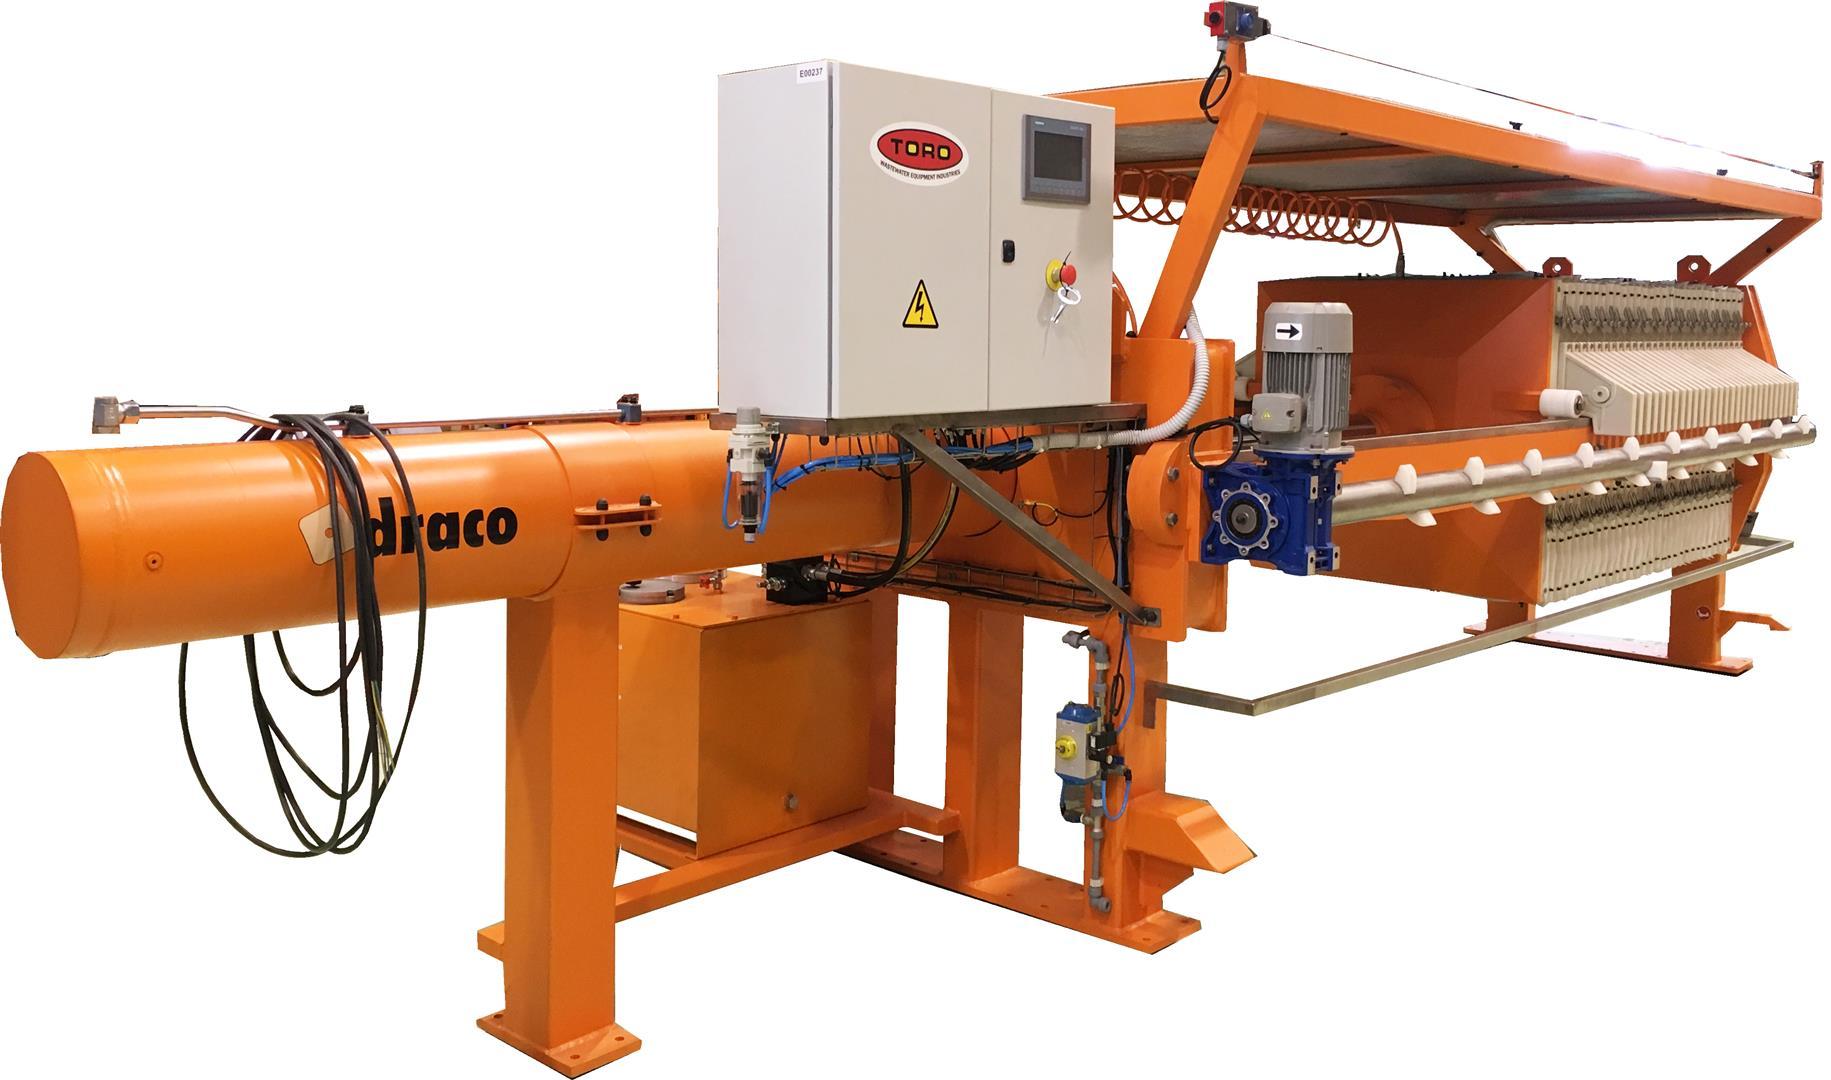 Filtro-Prensa-Automático-Draco-FPA-100-30